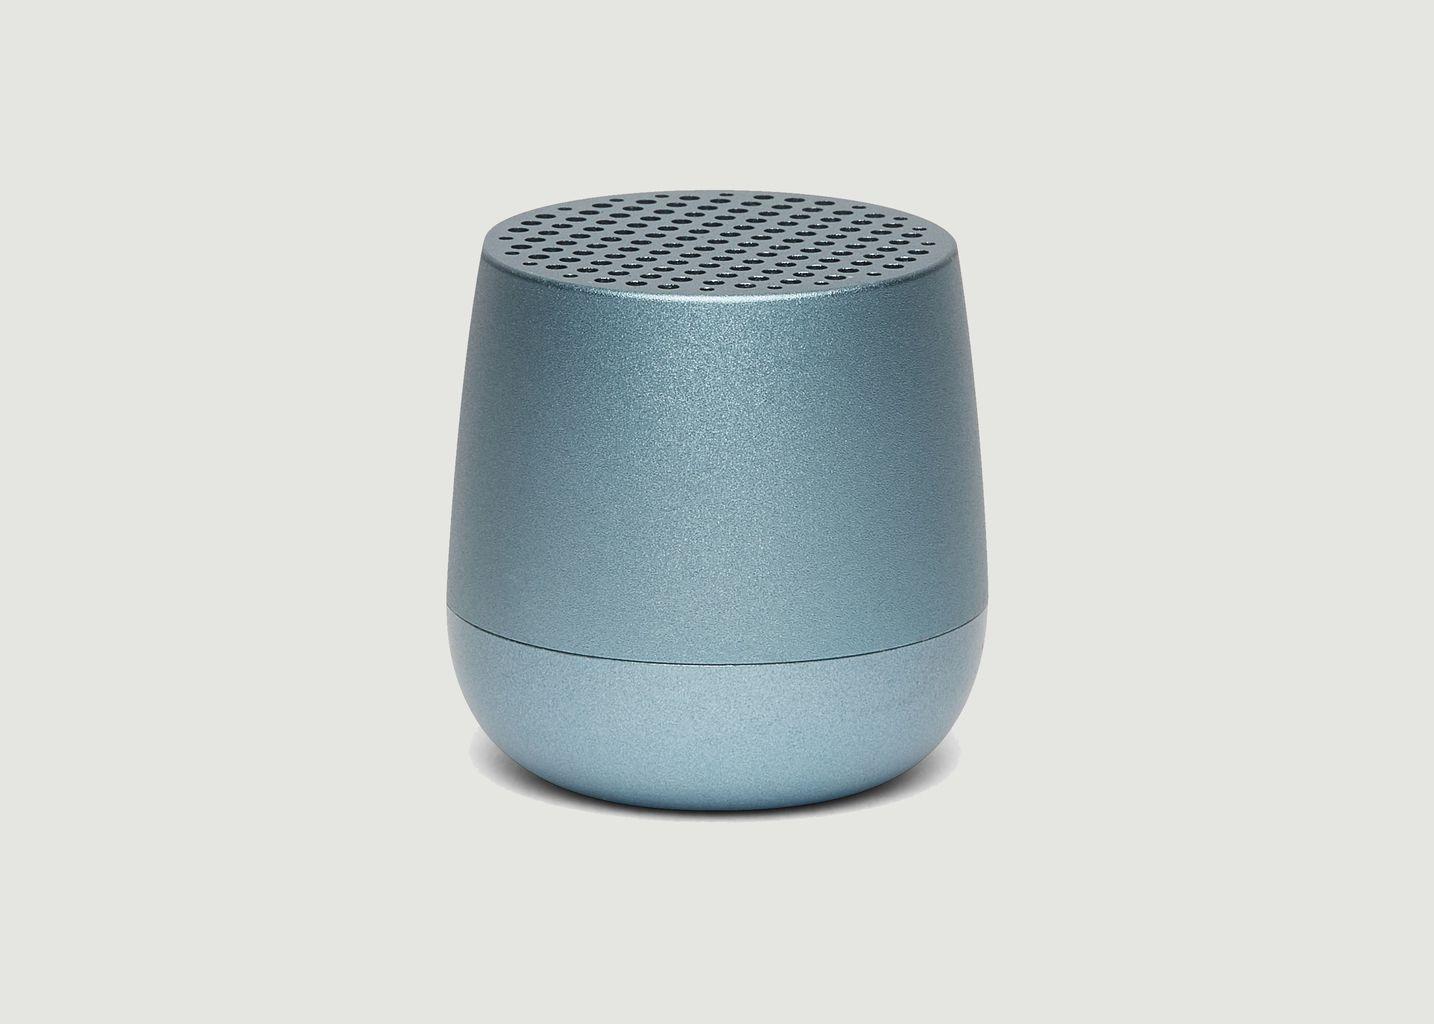 Mini Enceinte Bluetooth Mino - Lexon Design